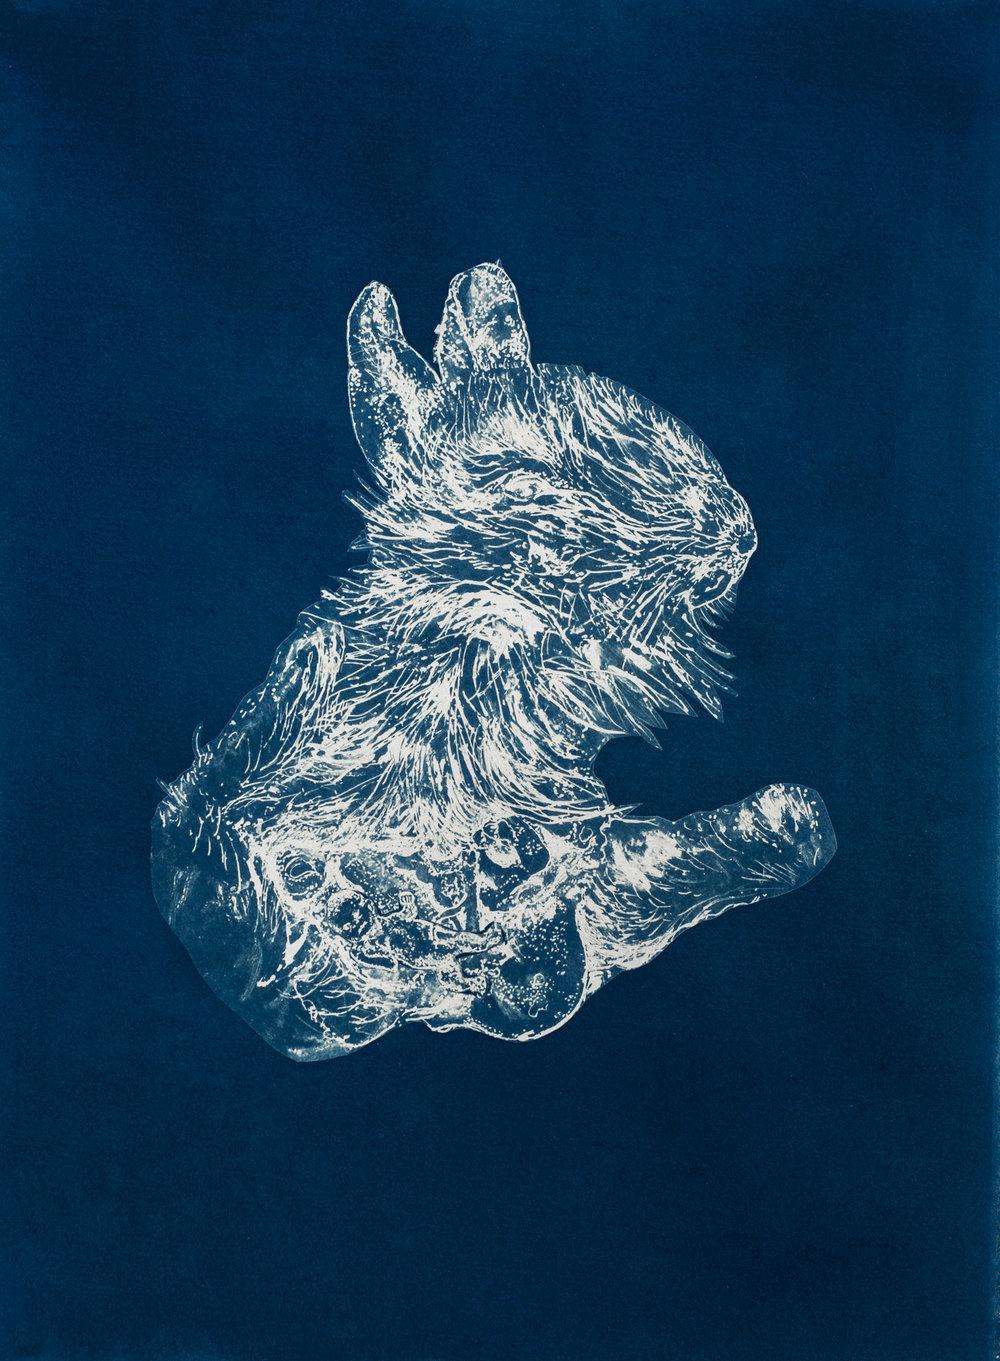 rabbit copy.jpg